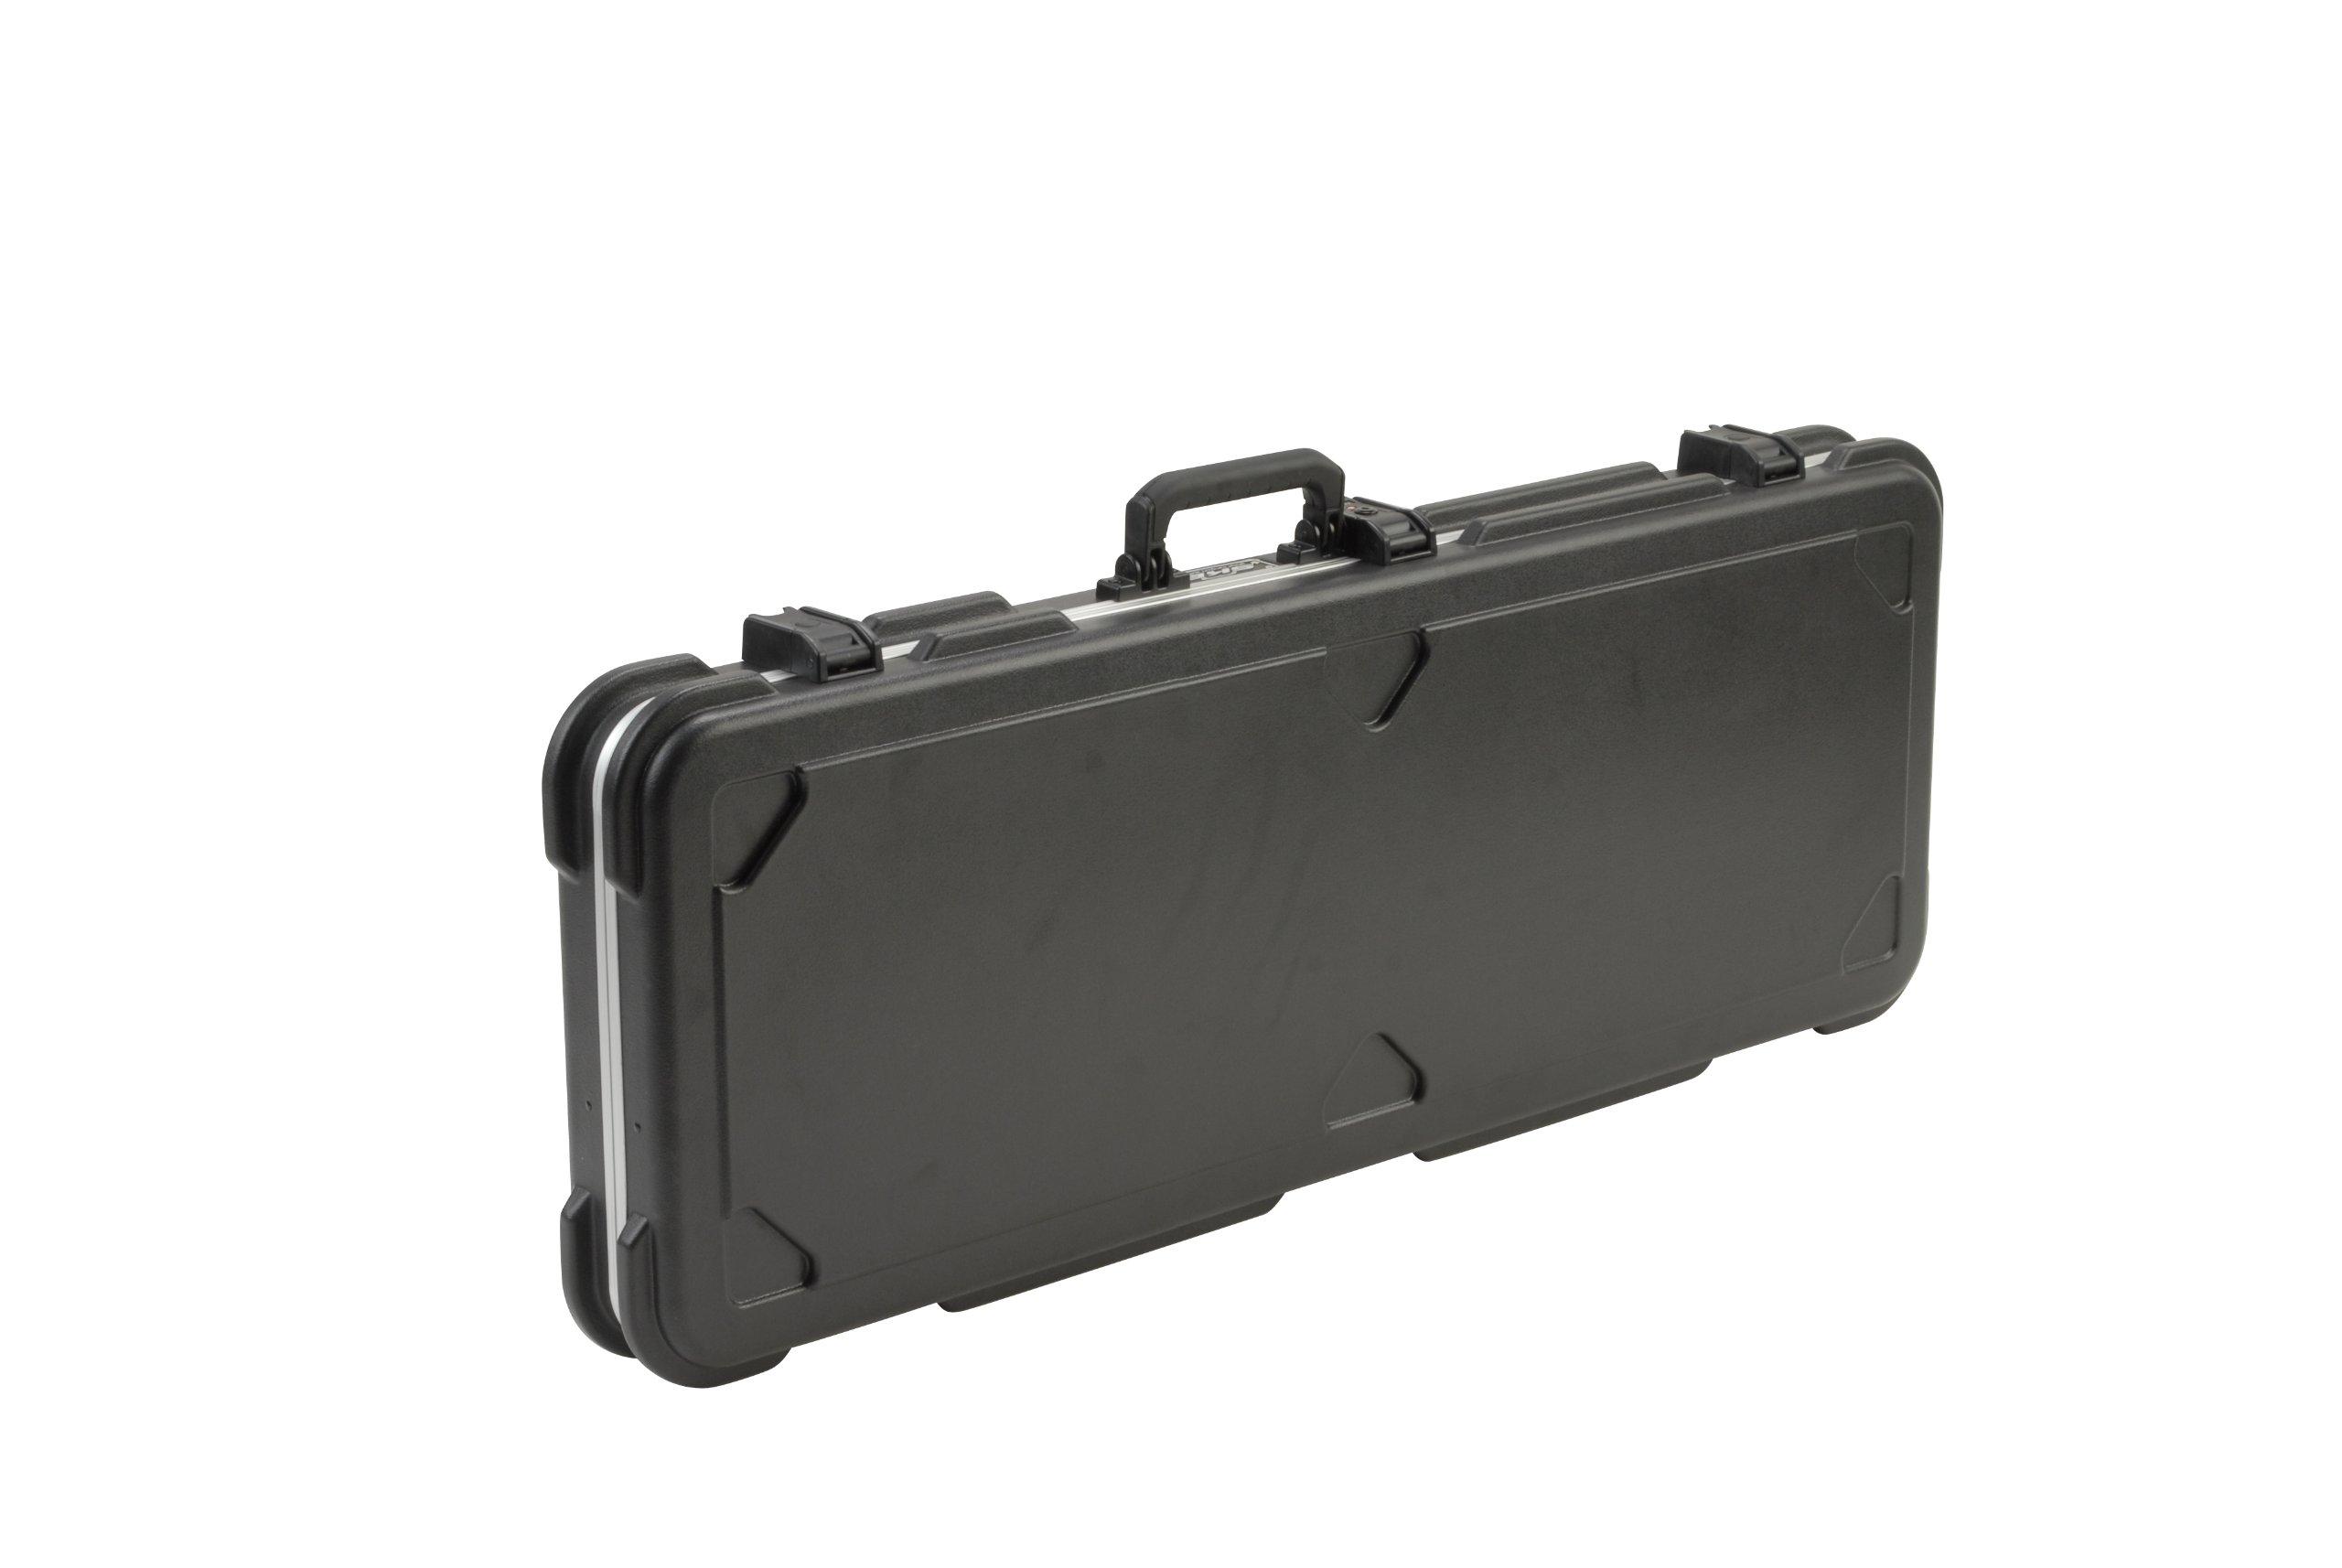 SKB Jaguar/Jazzmaster Type Shaped Hardshell Case 6-string Guitars only...not Bass - TSA Latch, Over-Molded Handle